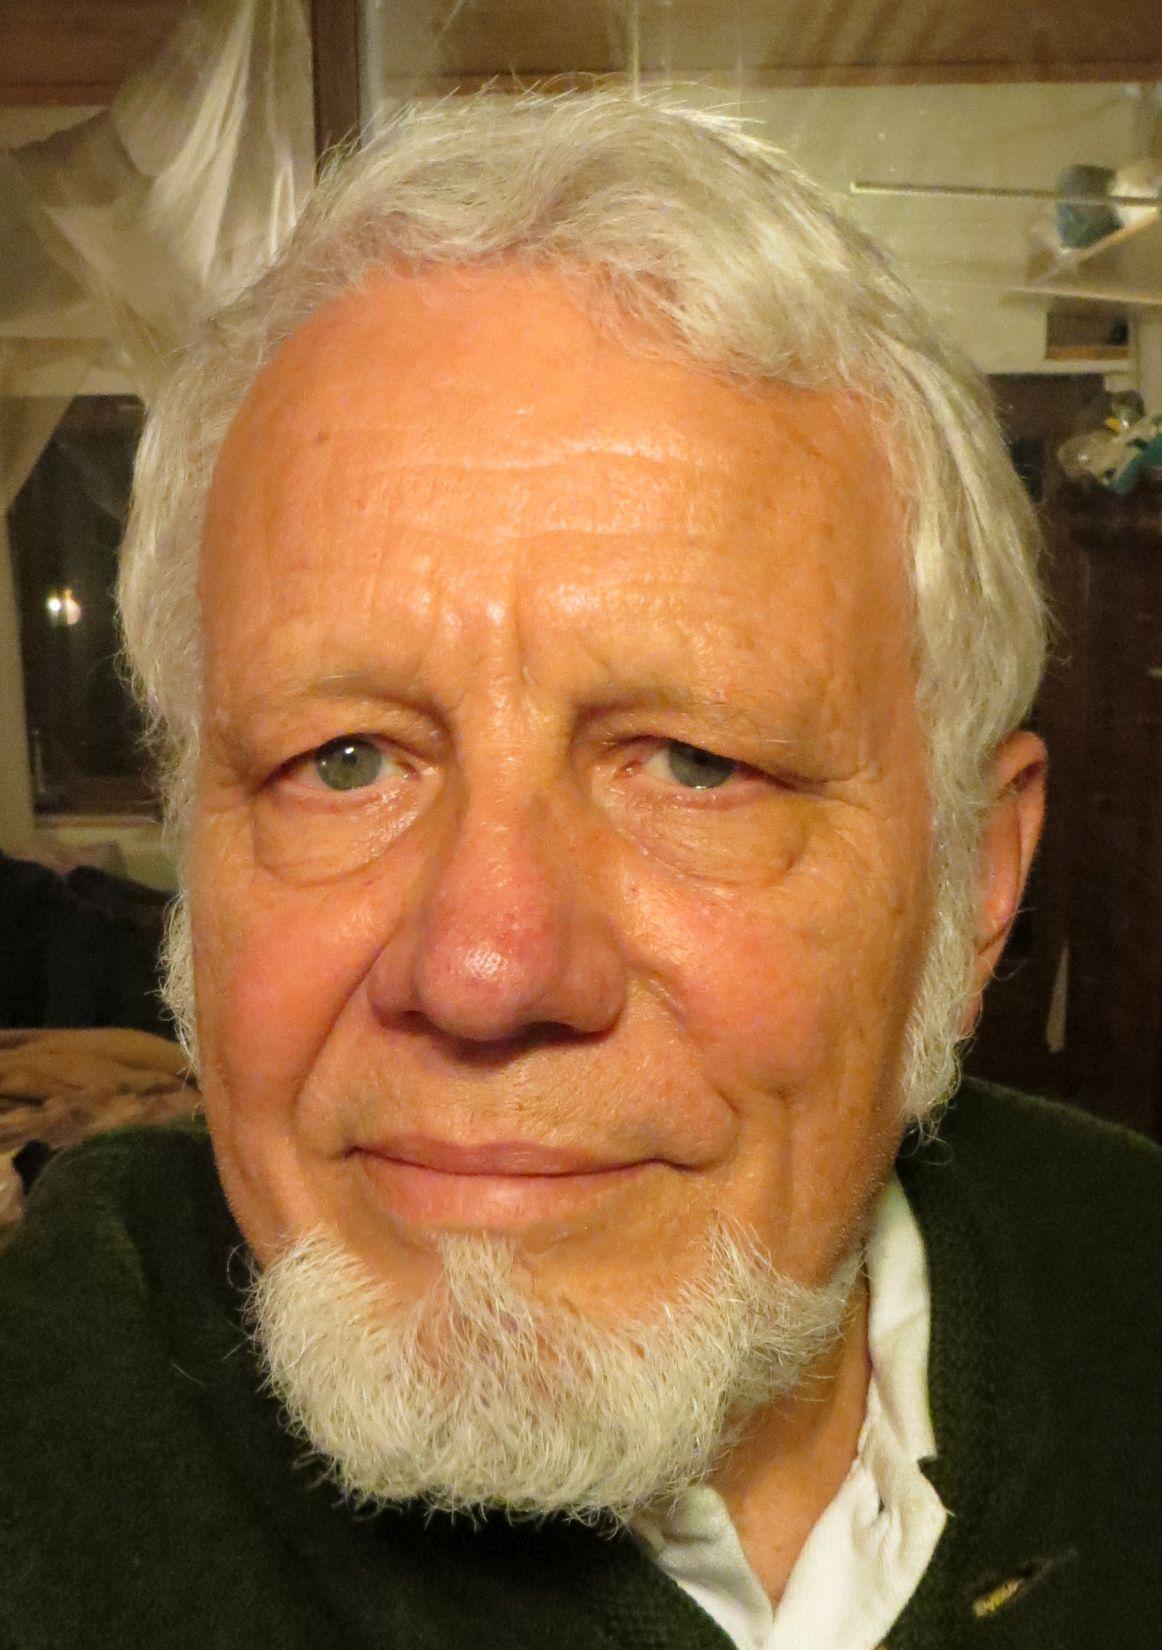 Hans-Jörg Langen